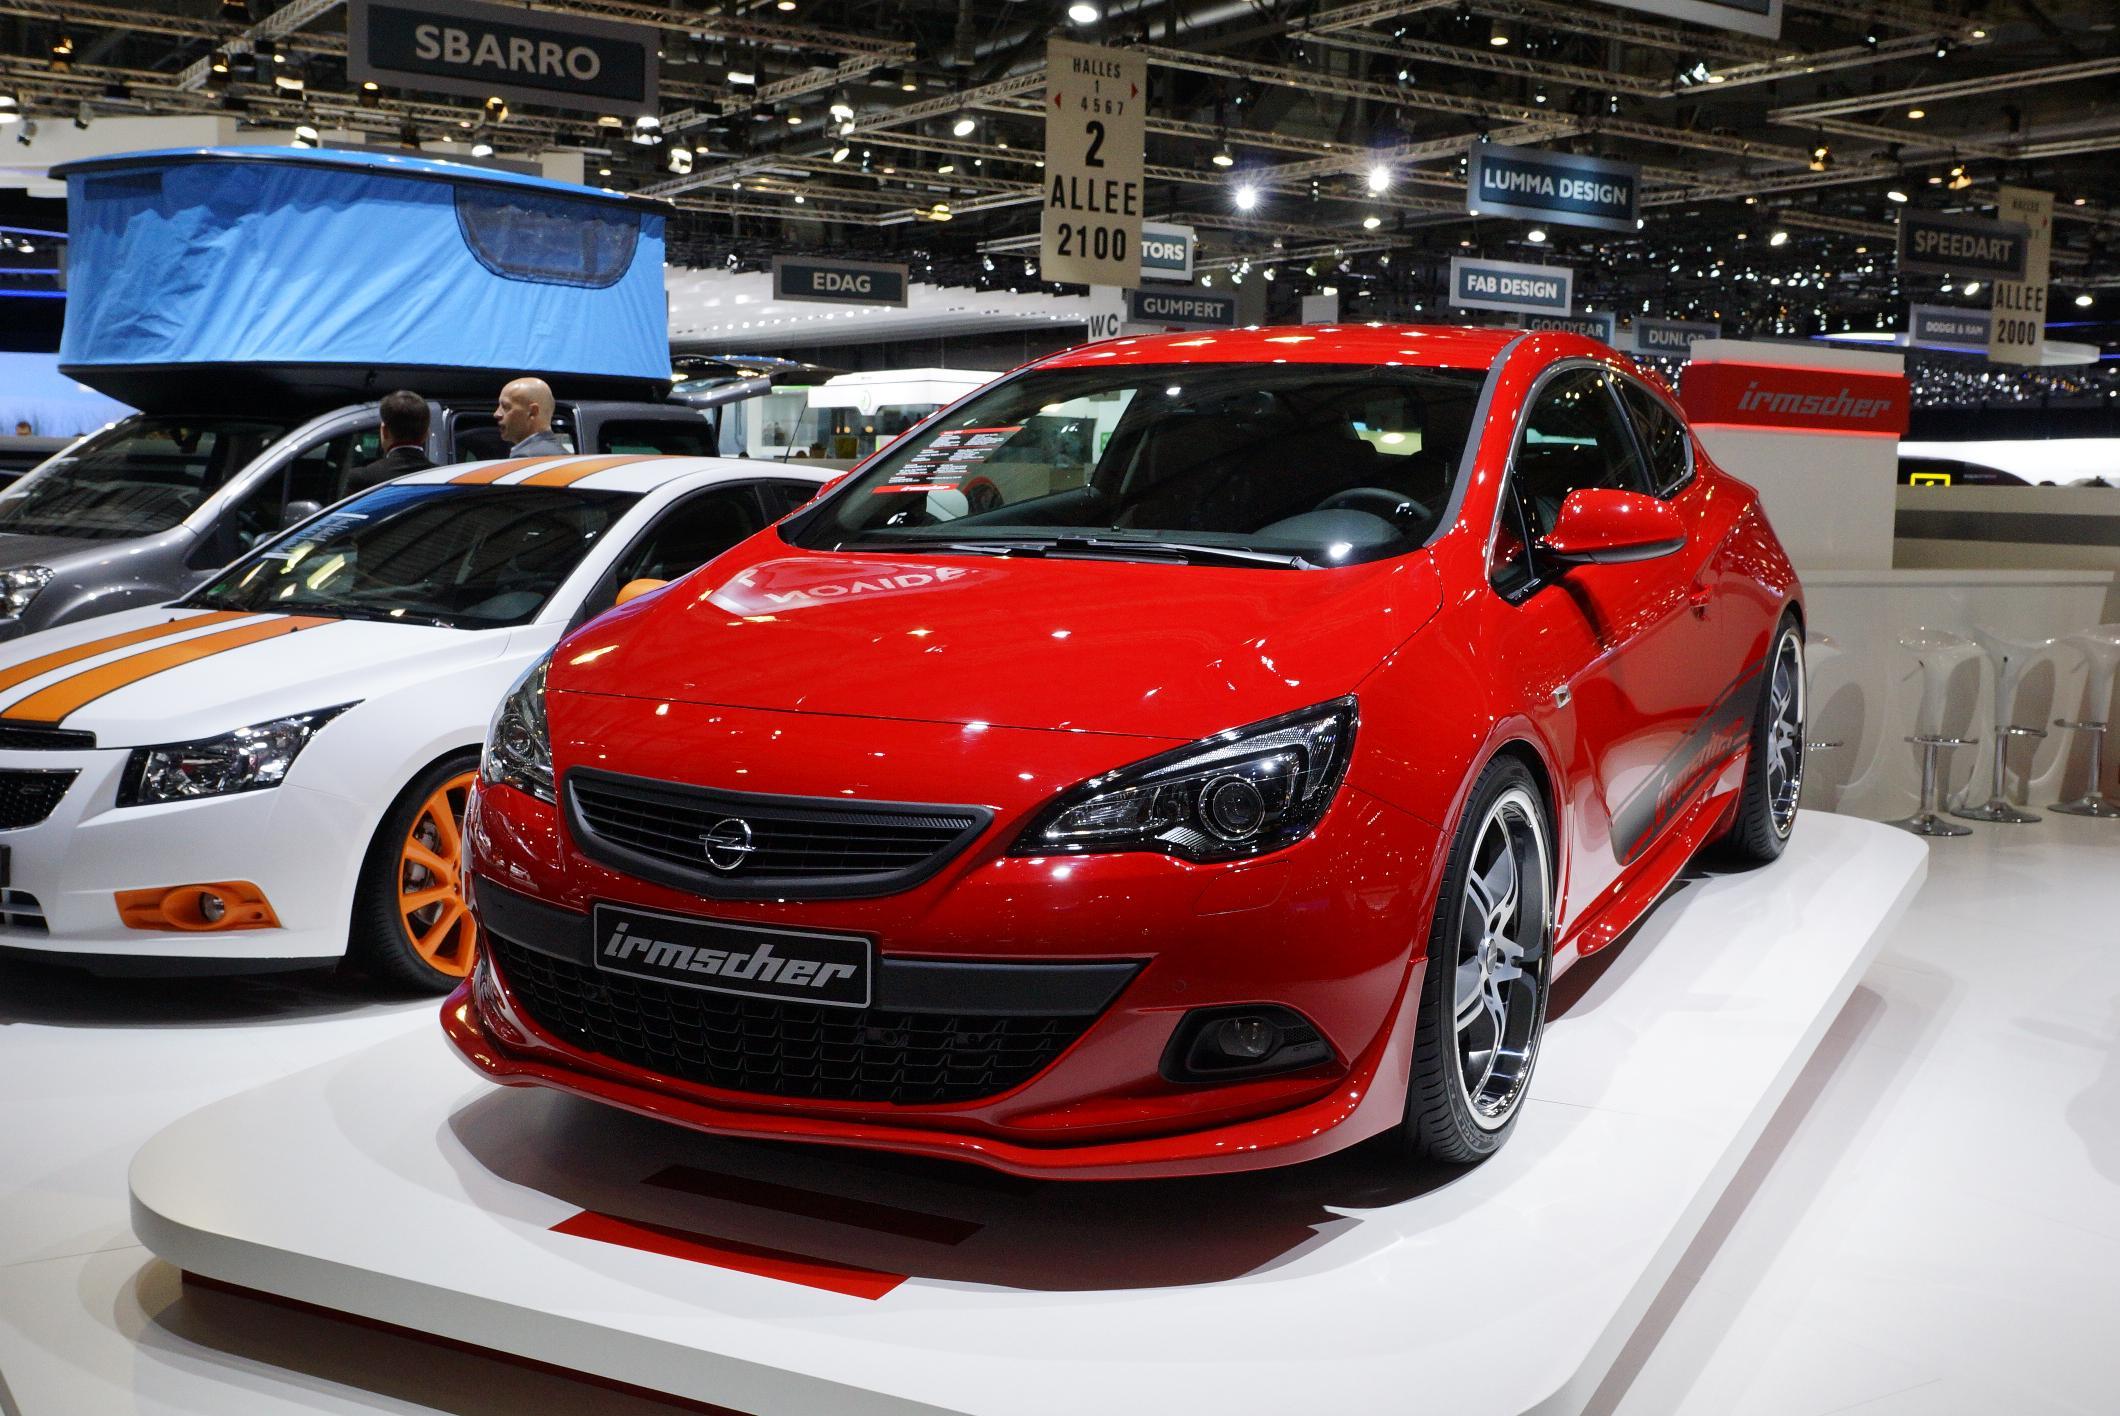 Irmscher Opel Astra Gevena 2012